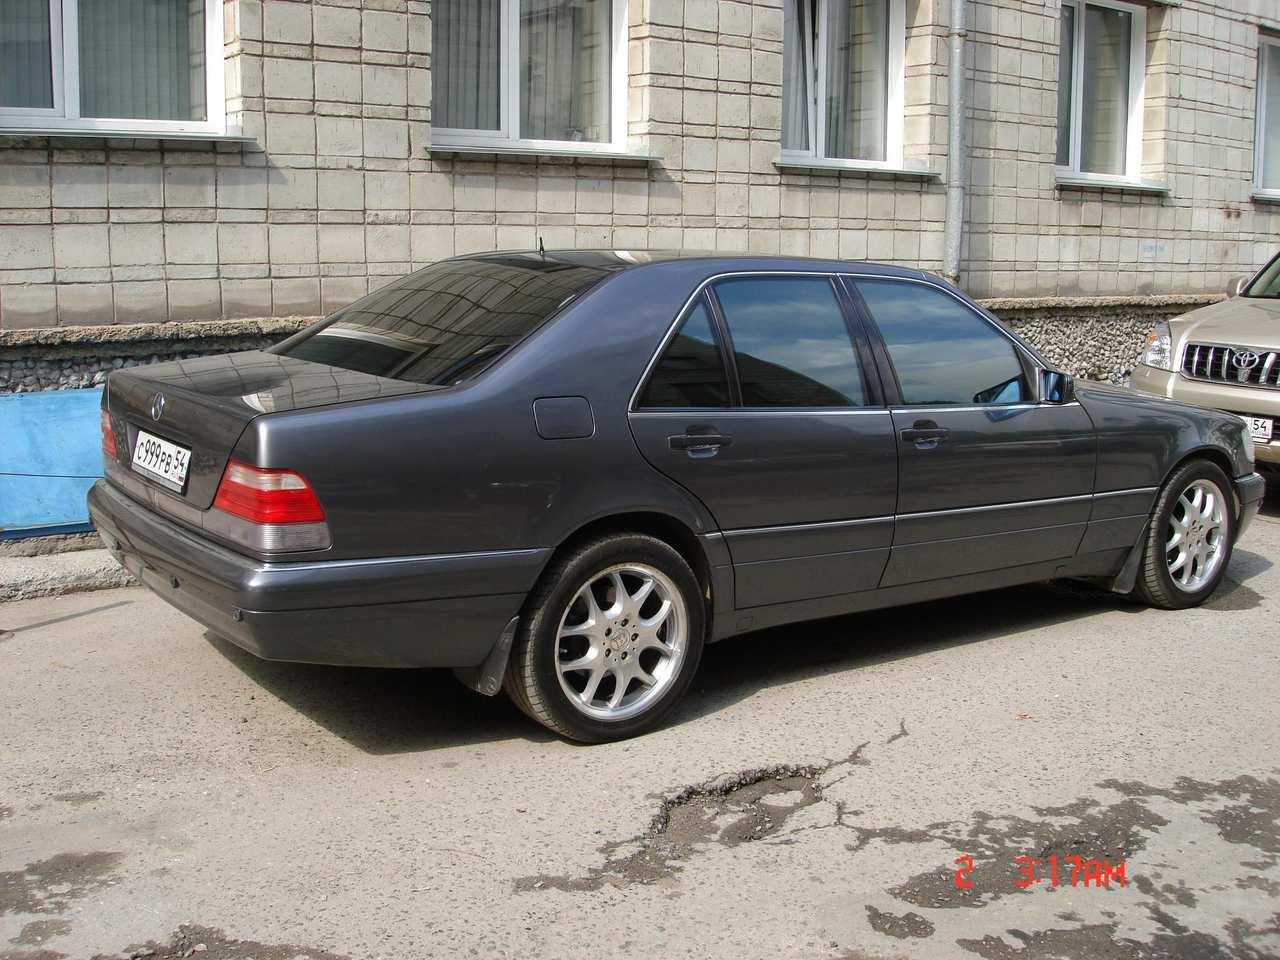 1997 Mercedes Benz S Class Photos 4 2 Gasoline Fr Or Rr